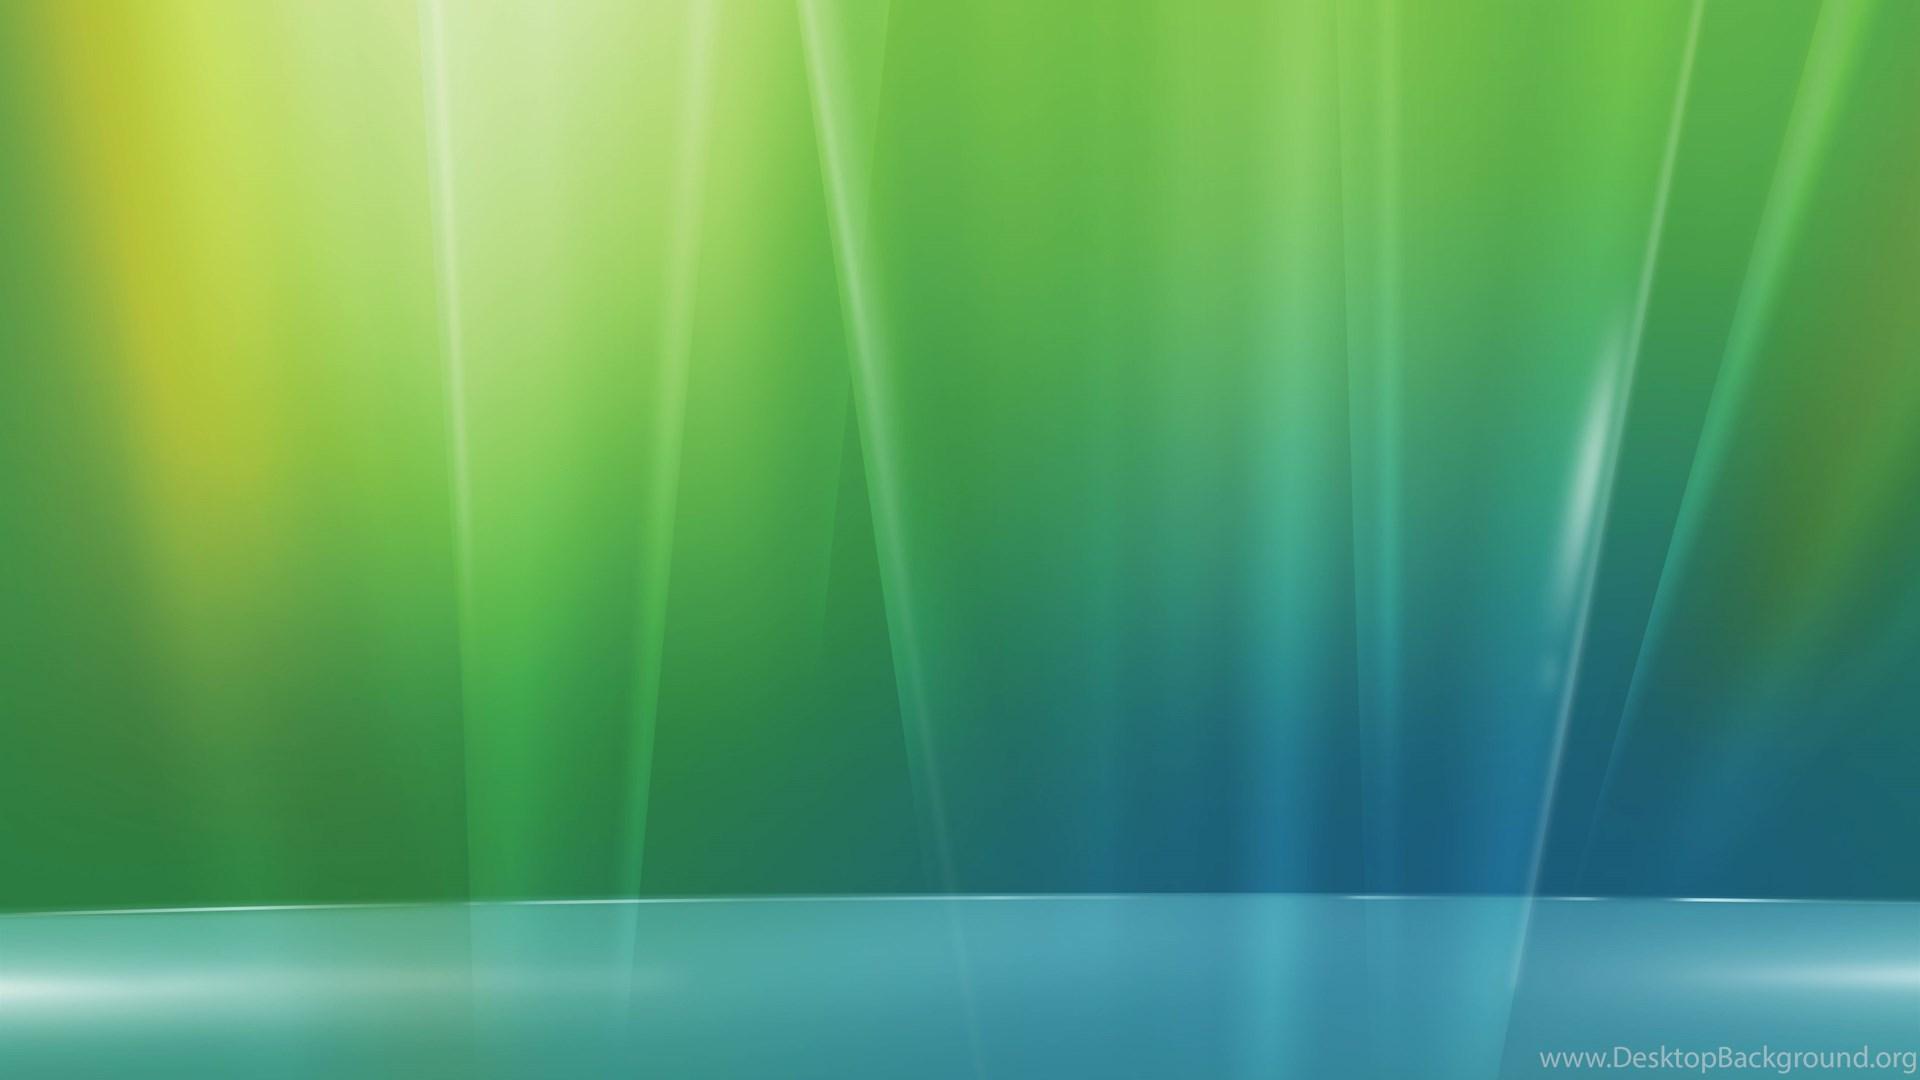 Windows Vista Aurora Wallpapers - Hd Wallpapers N Desktop ...